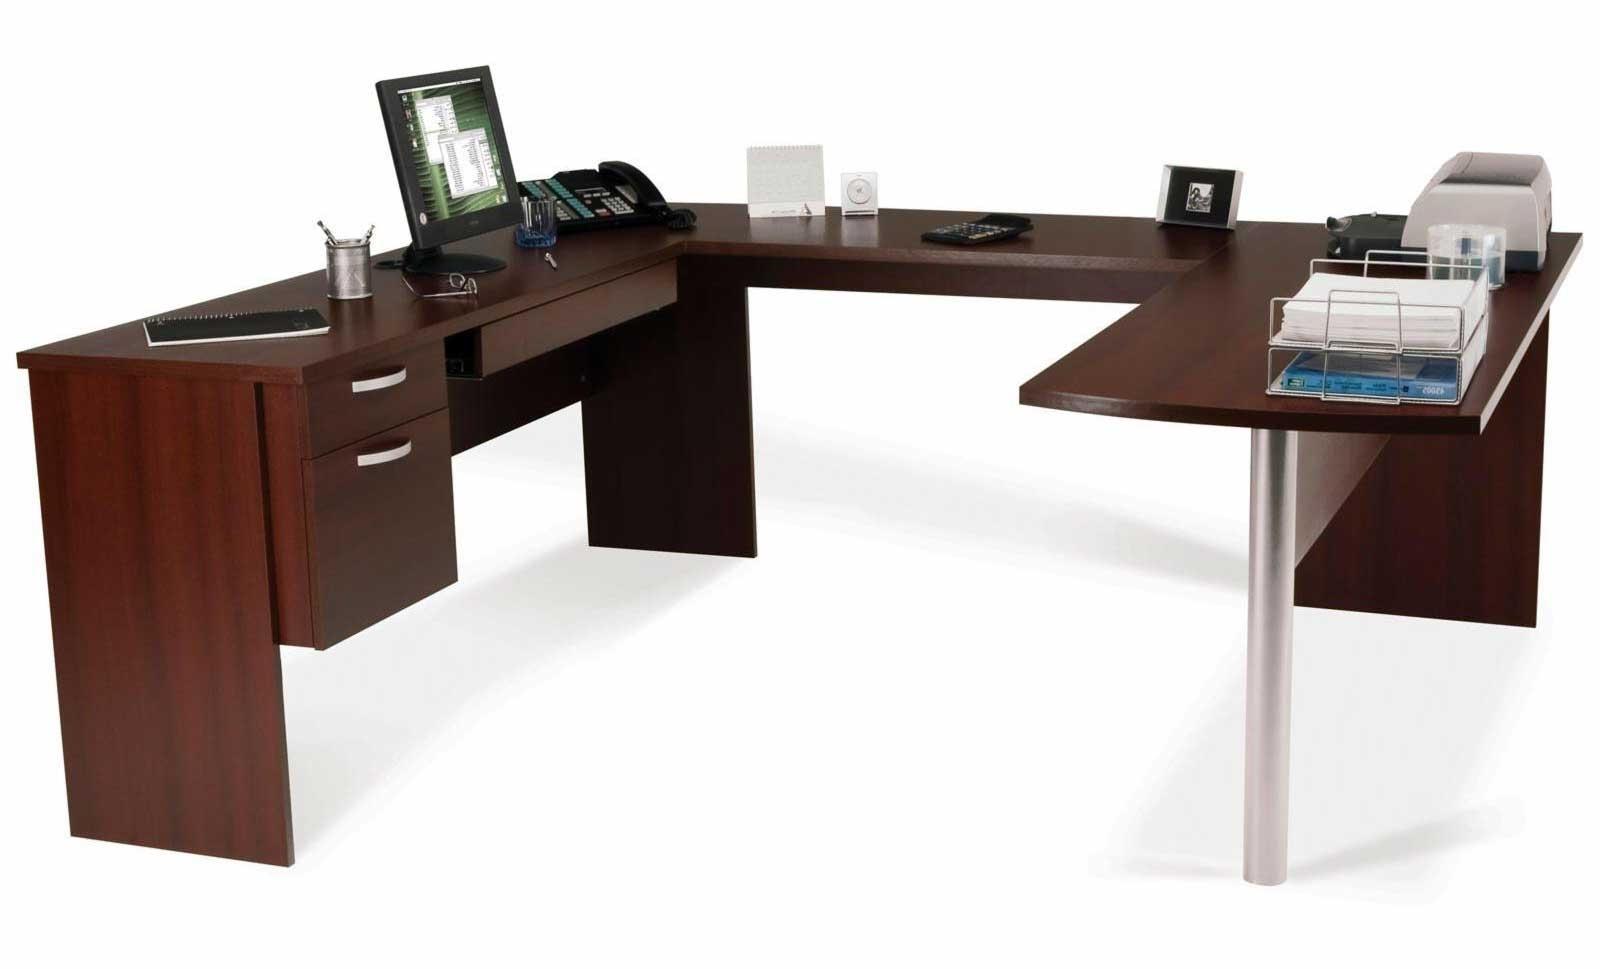 2019 Oak U Shaped Corner Computer Desk — Interior Exterior Homie For U Shaped Computer Desks (View 6 of 20)